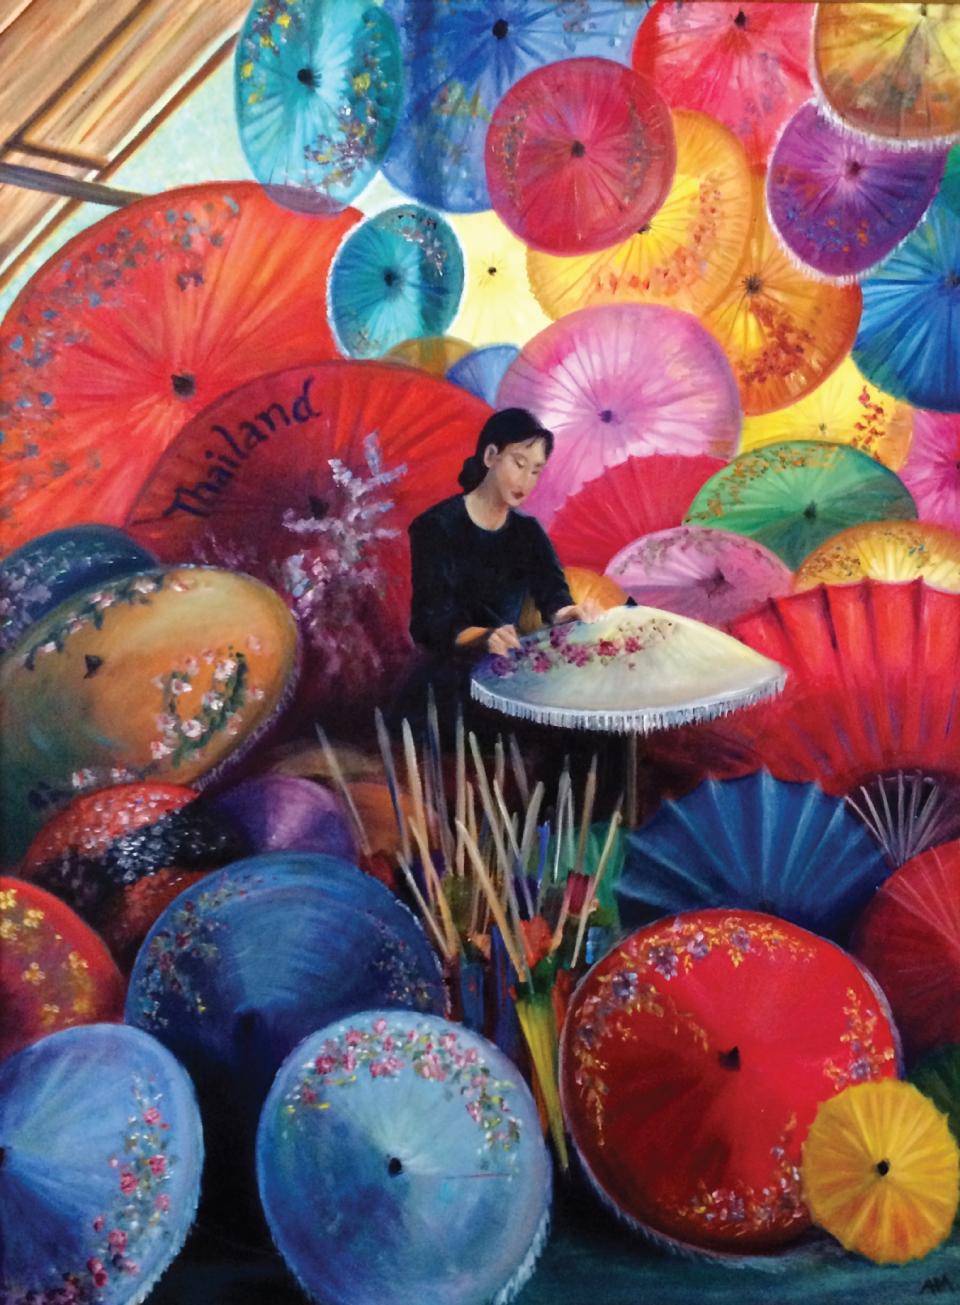 abby_howard_murphy-thai_parasols_01